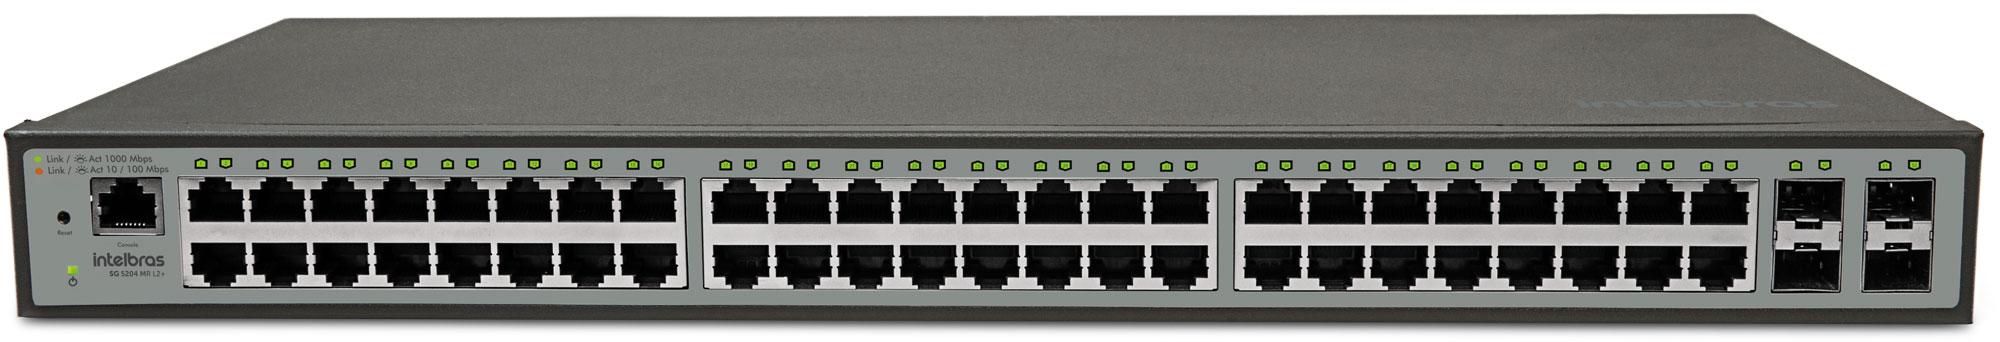 Switch Gerenciável 48P Giga SG 5204 MR L2+ Intelbras